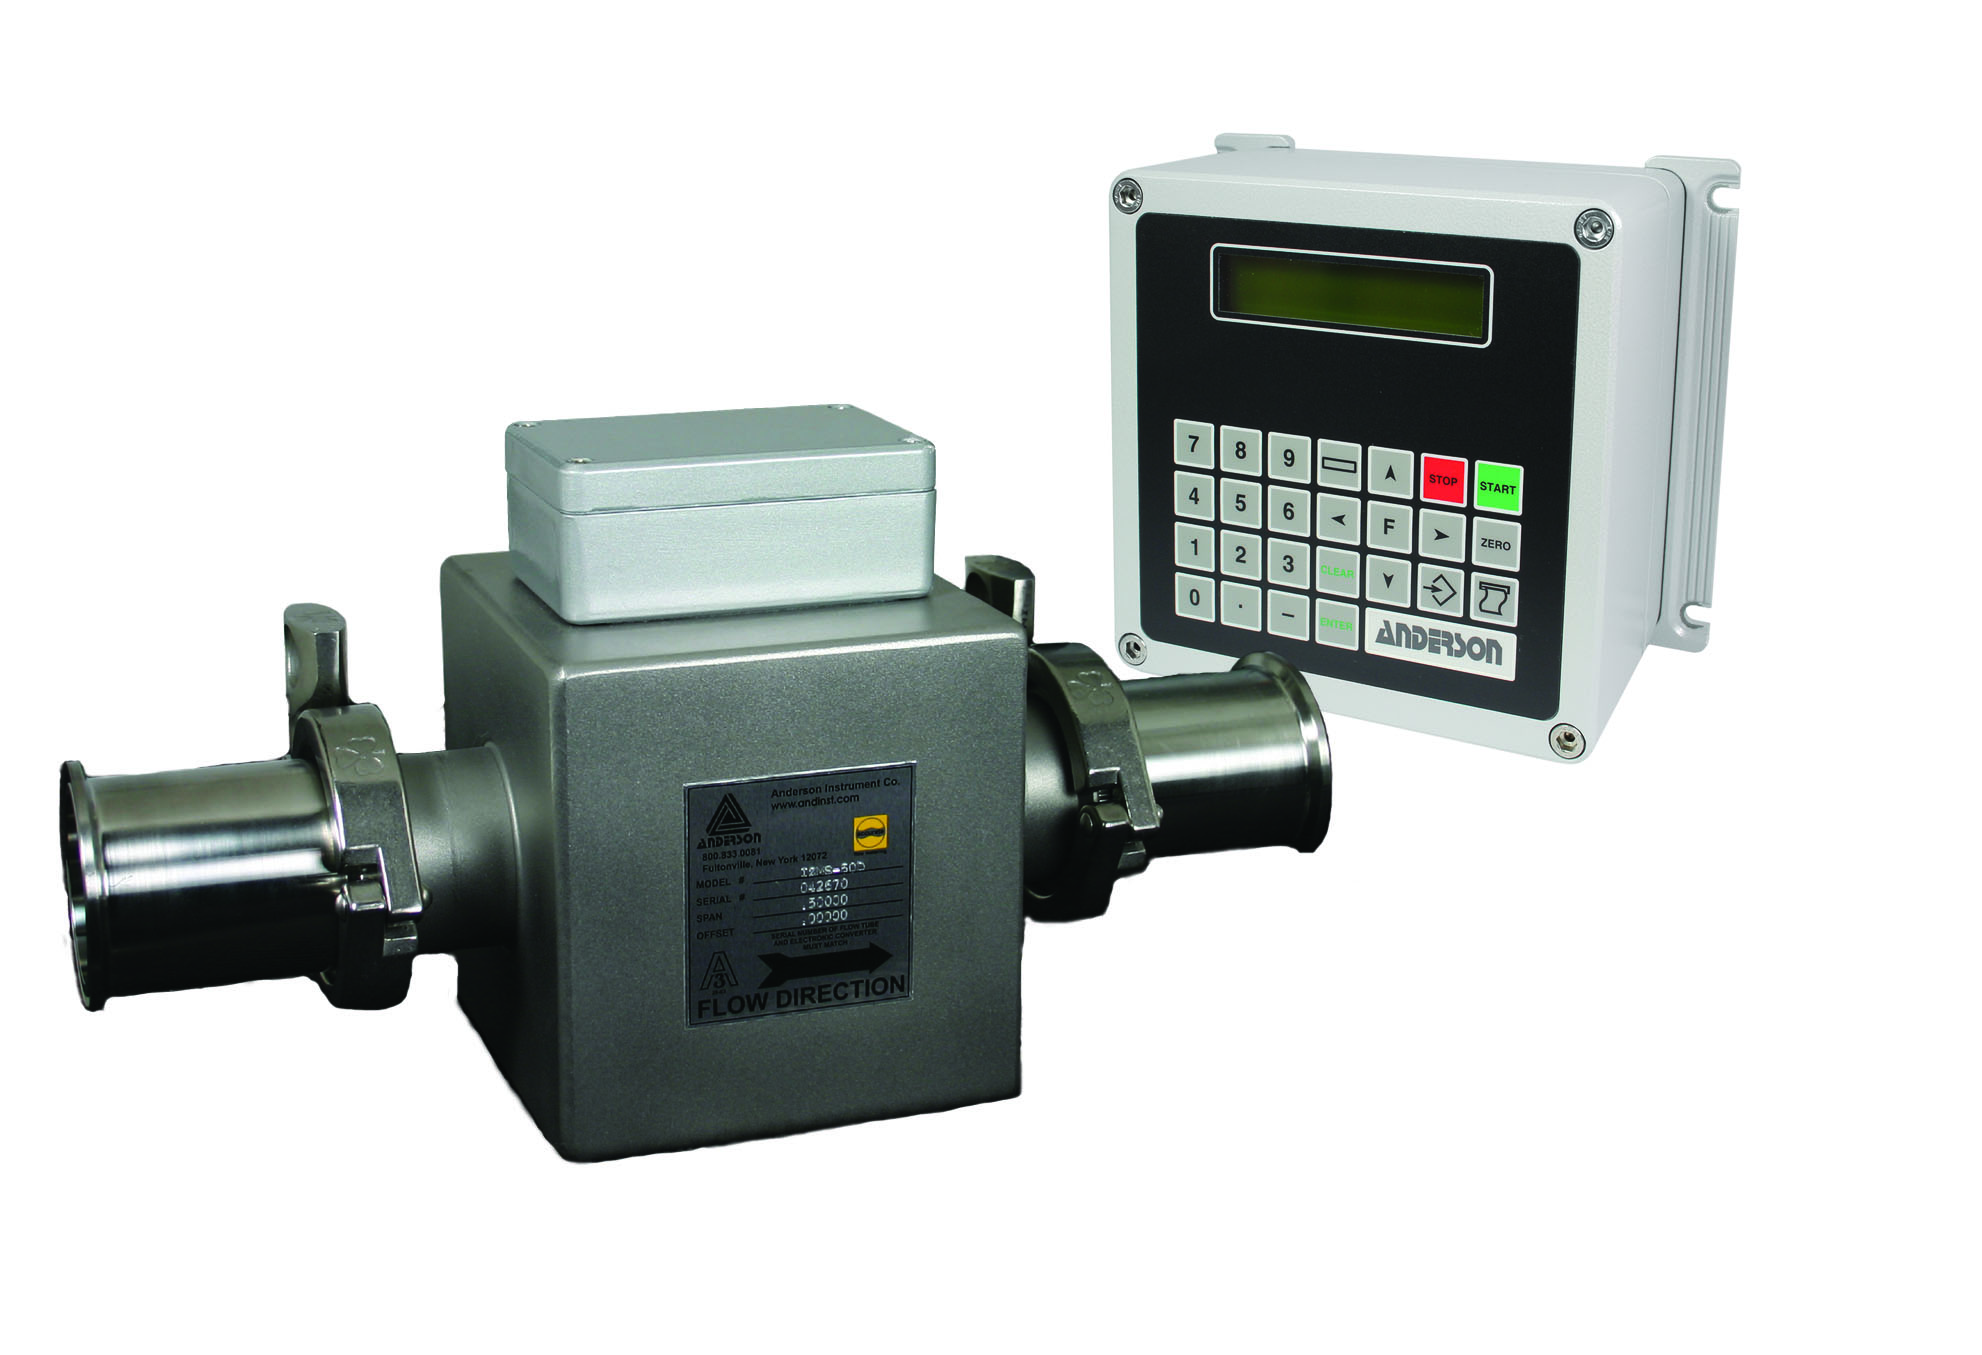 IZMS Magnetic Flowmeter - Controles de Pasteurización - Img 1 - Anderson-Negele